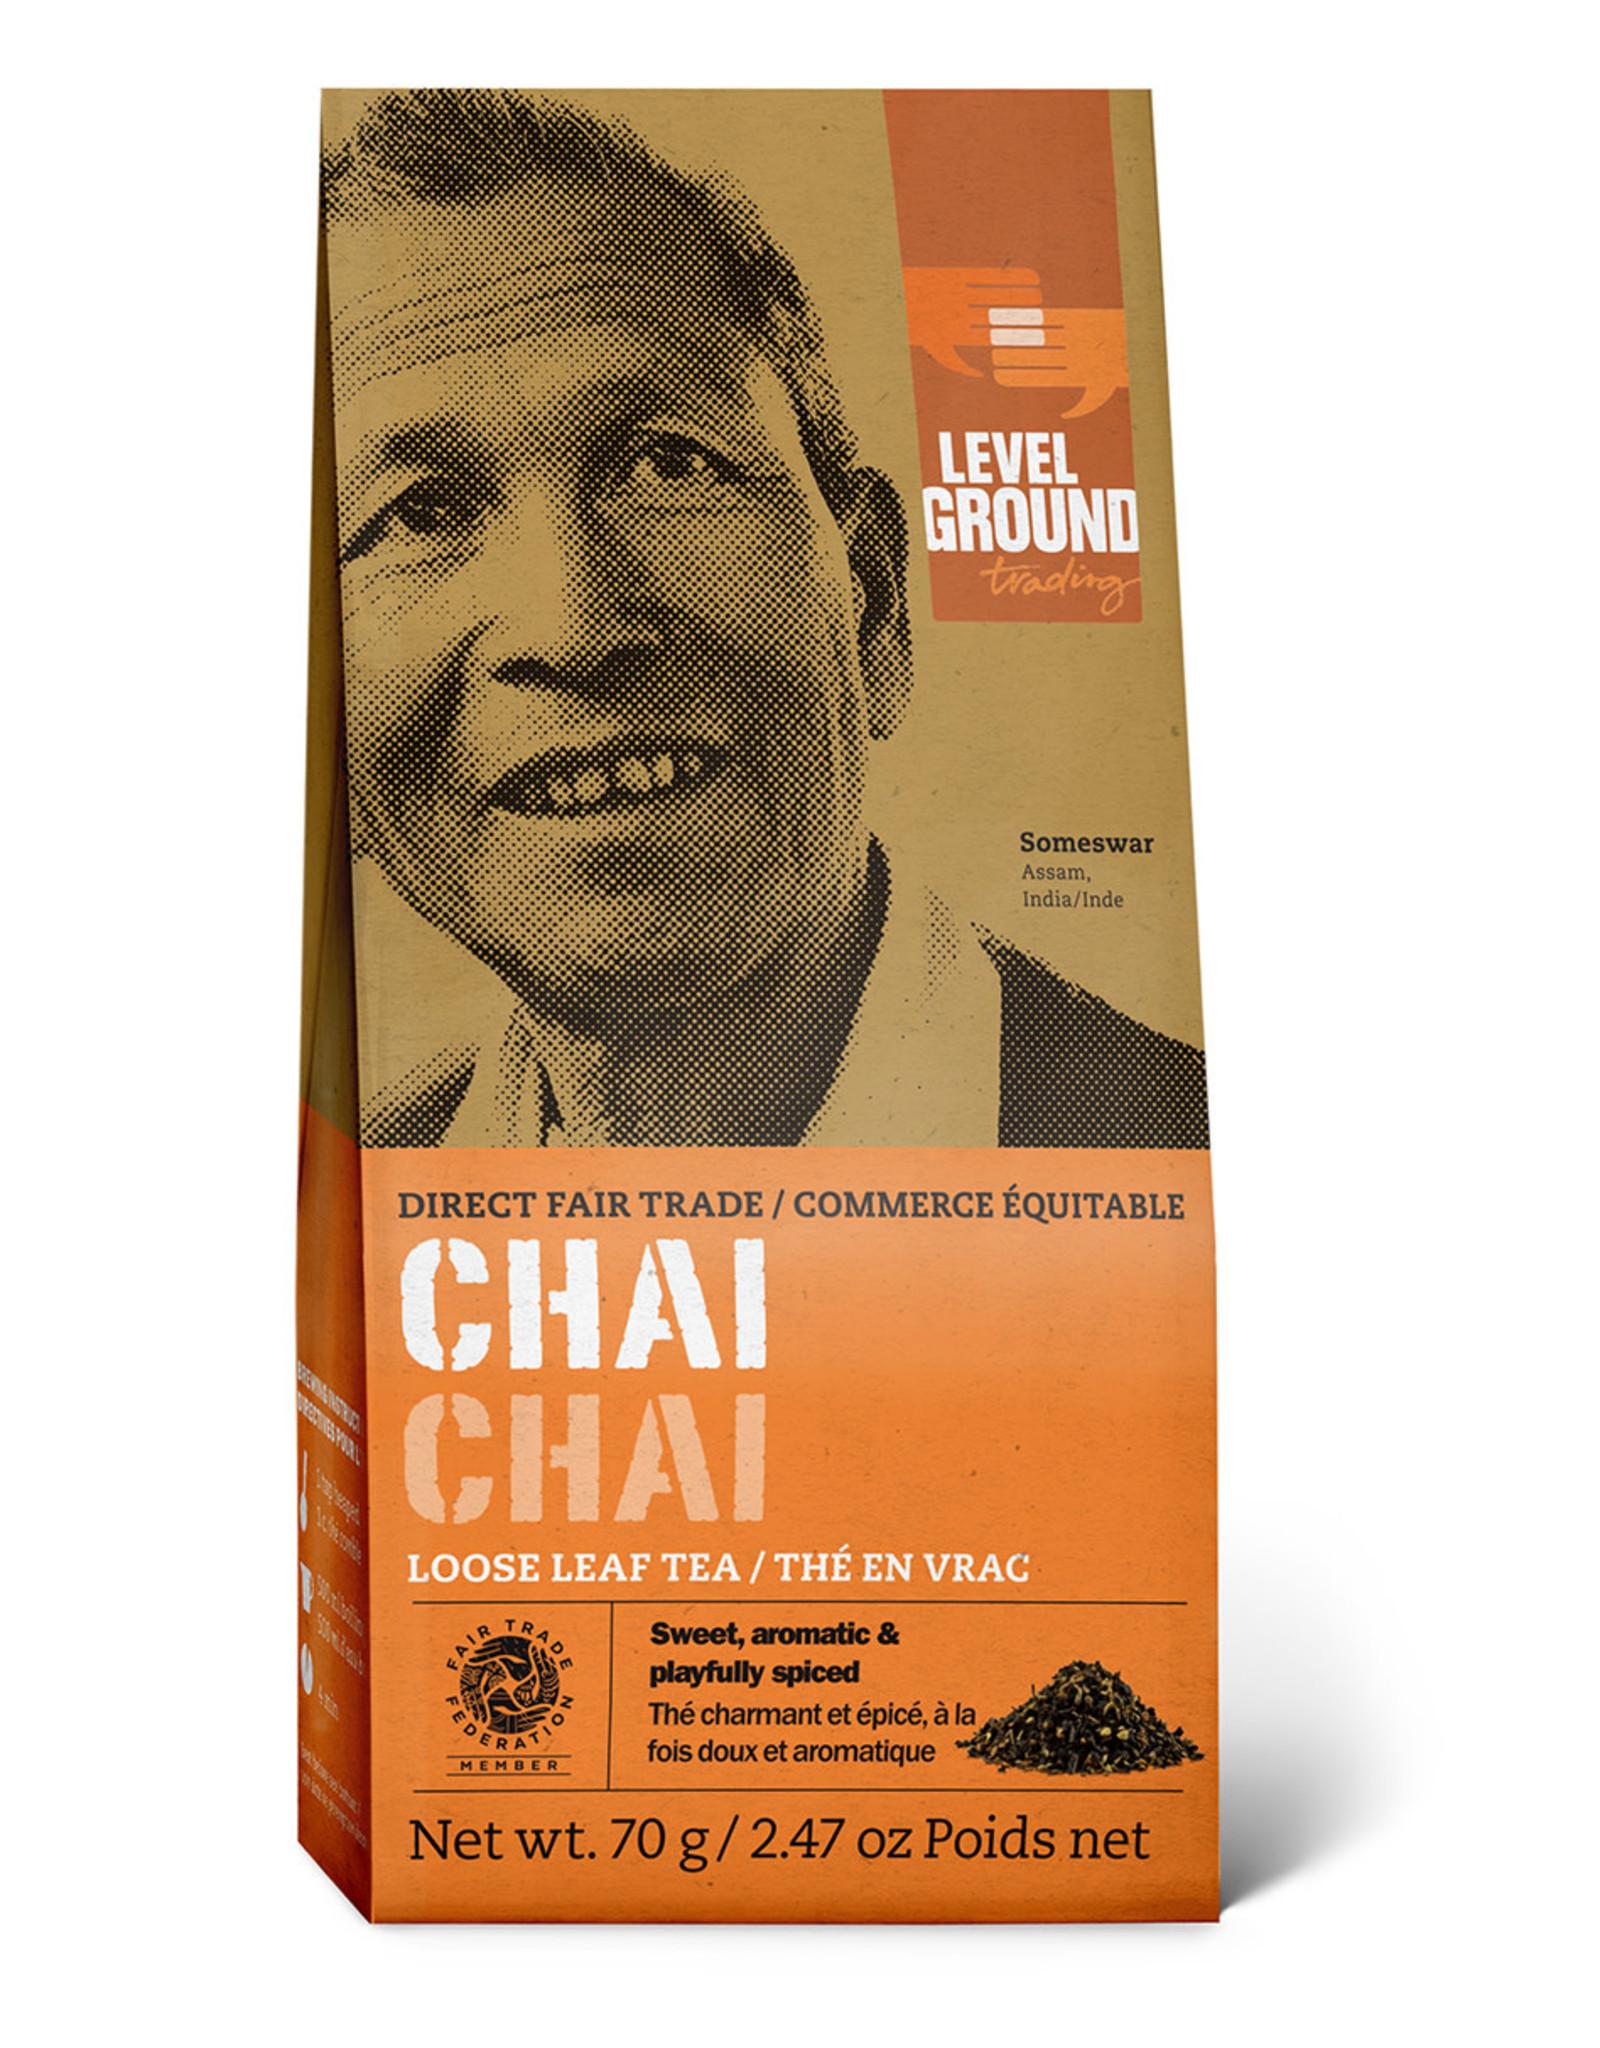 Level Ground Level Ground Chai Tea, loose